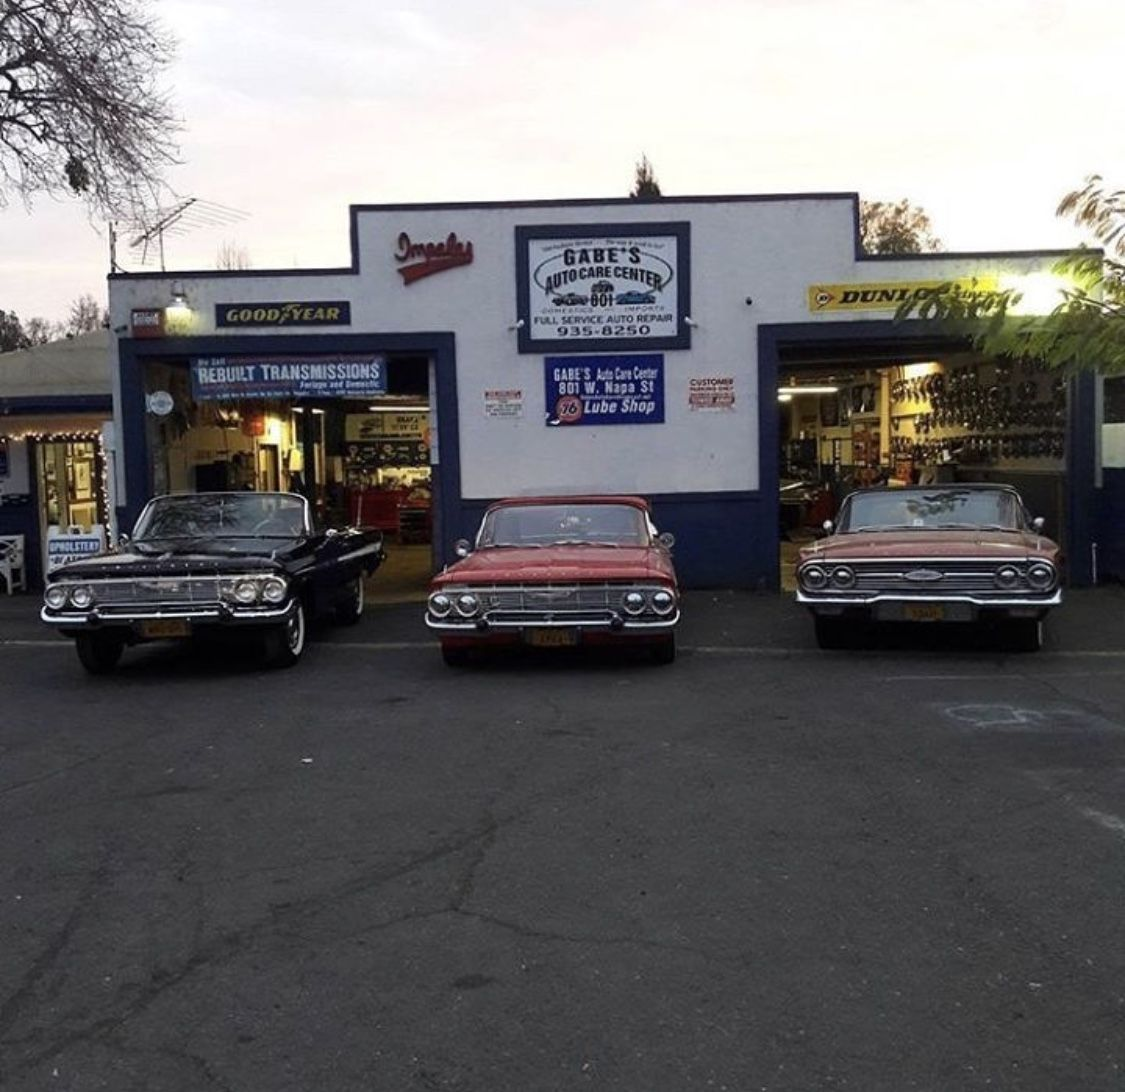 Pin By Jr On 1956 1957 1958 1959 1960 1961 1962 1963 1964 Chevrolet Rebuilt Transmission Chevrolet Impala Goodyear